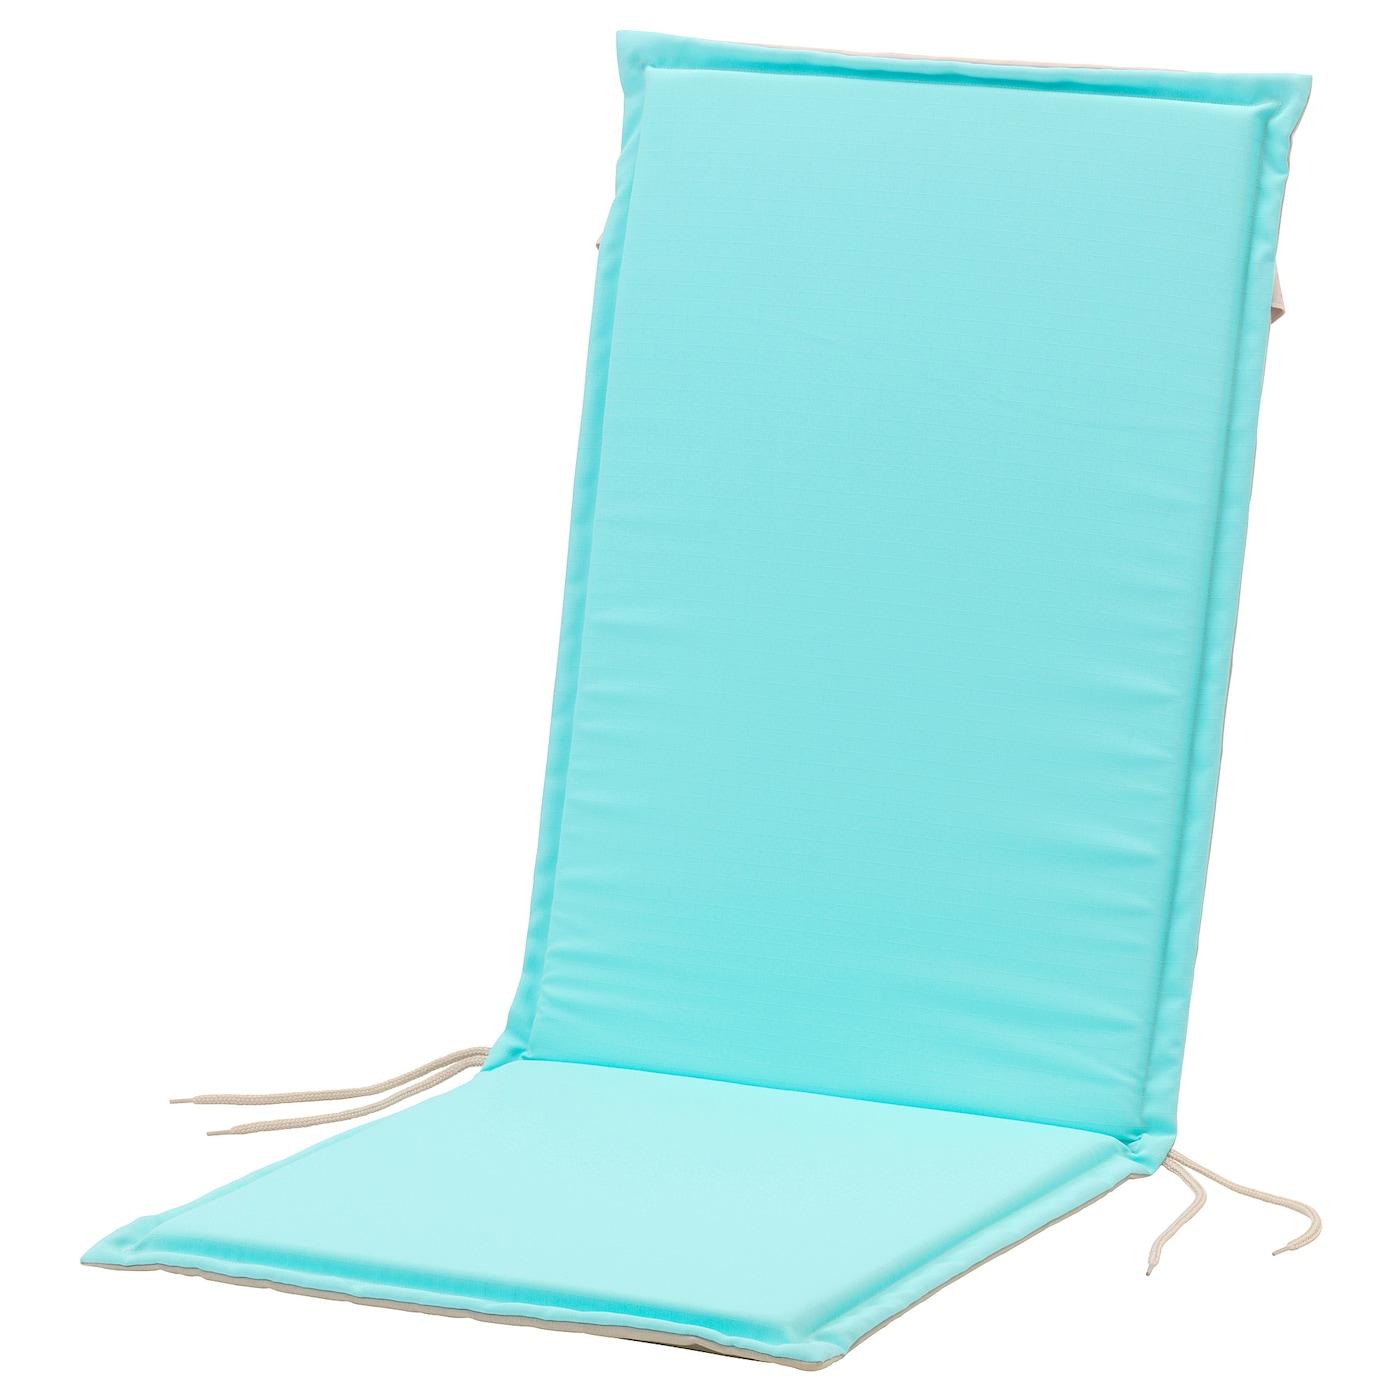 n st n coussin plat assise dossier ext turquoise beige 116x47 cm ikea. Black Bedroom Furniture Sets. Home Design Ideas